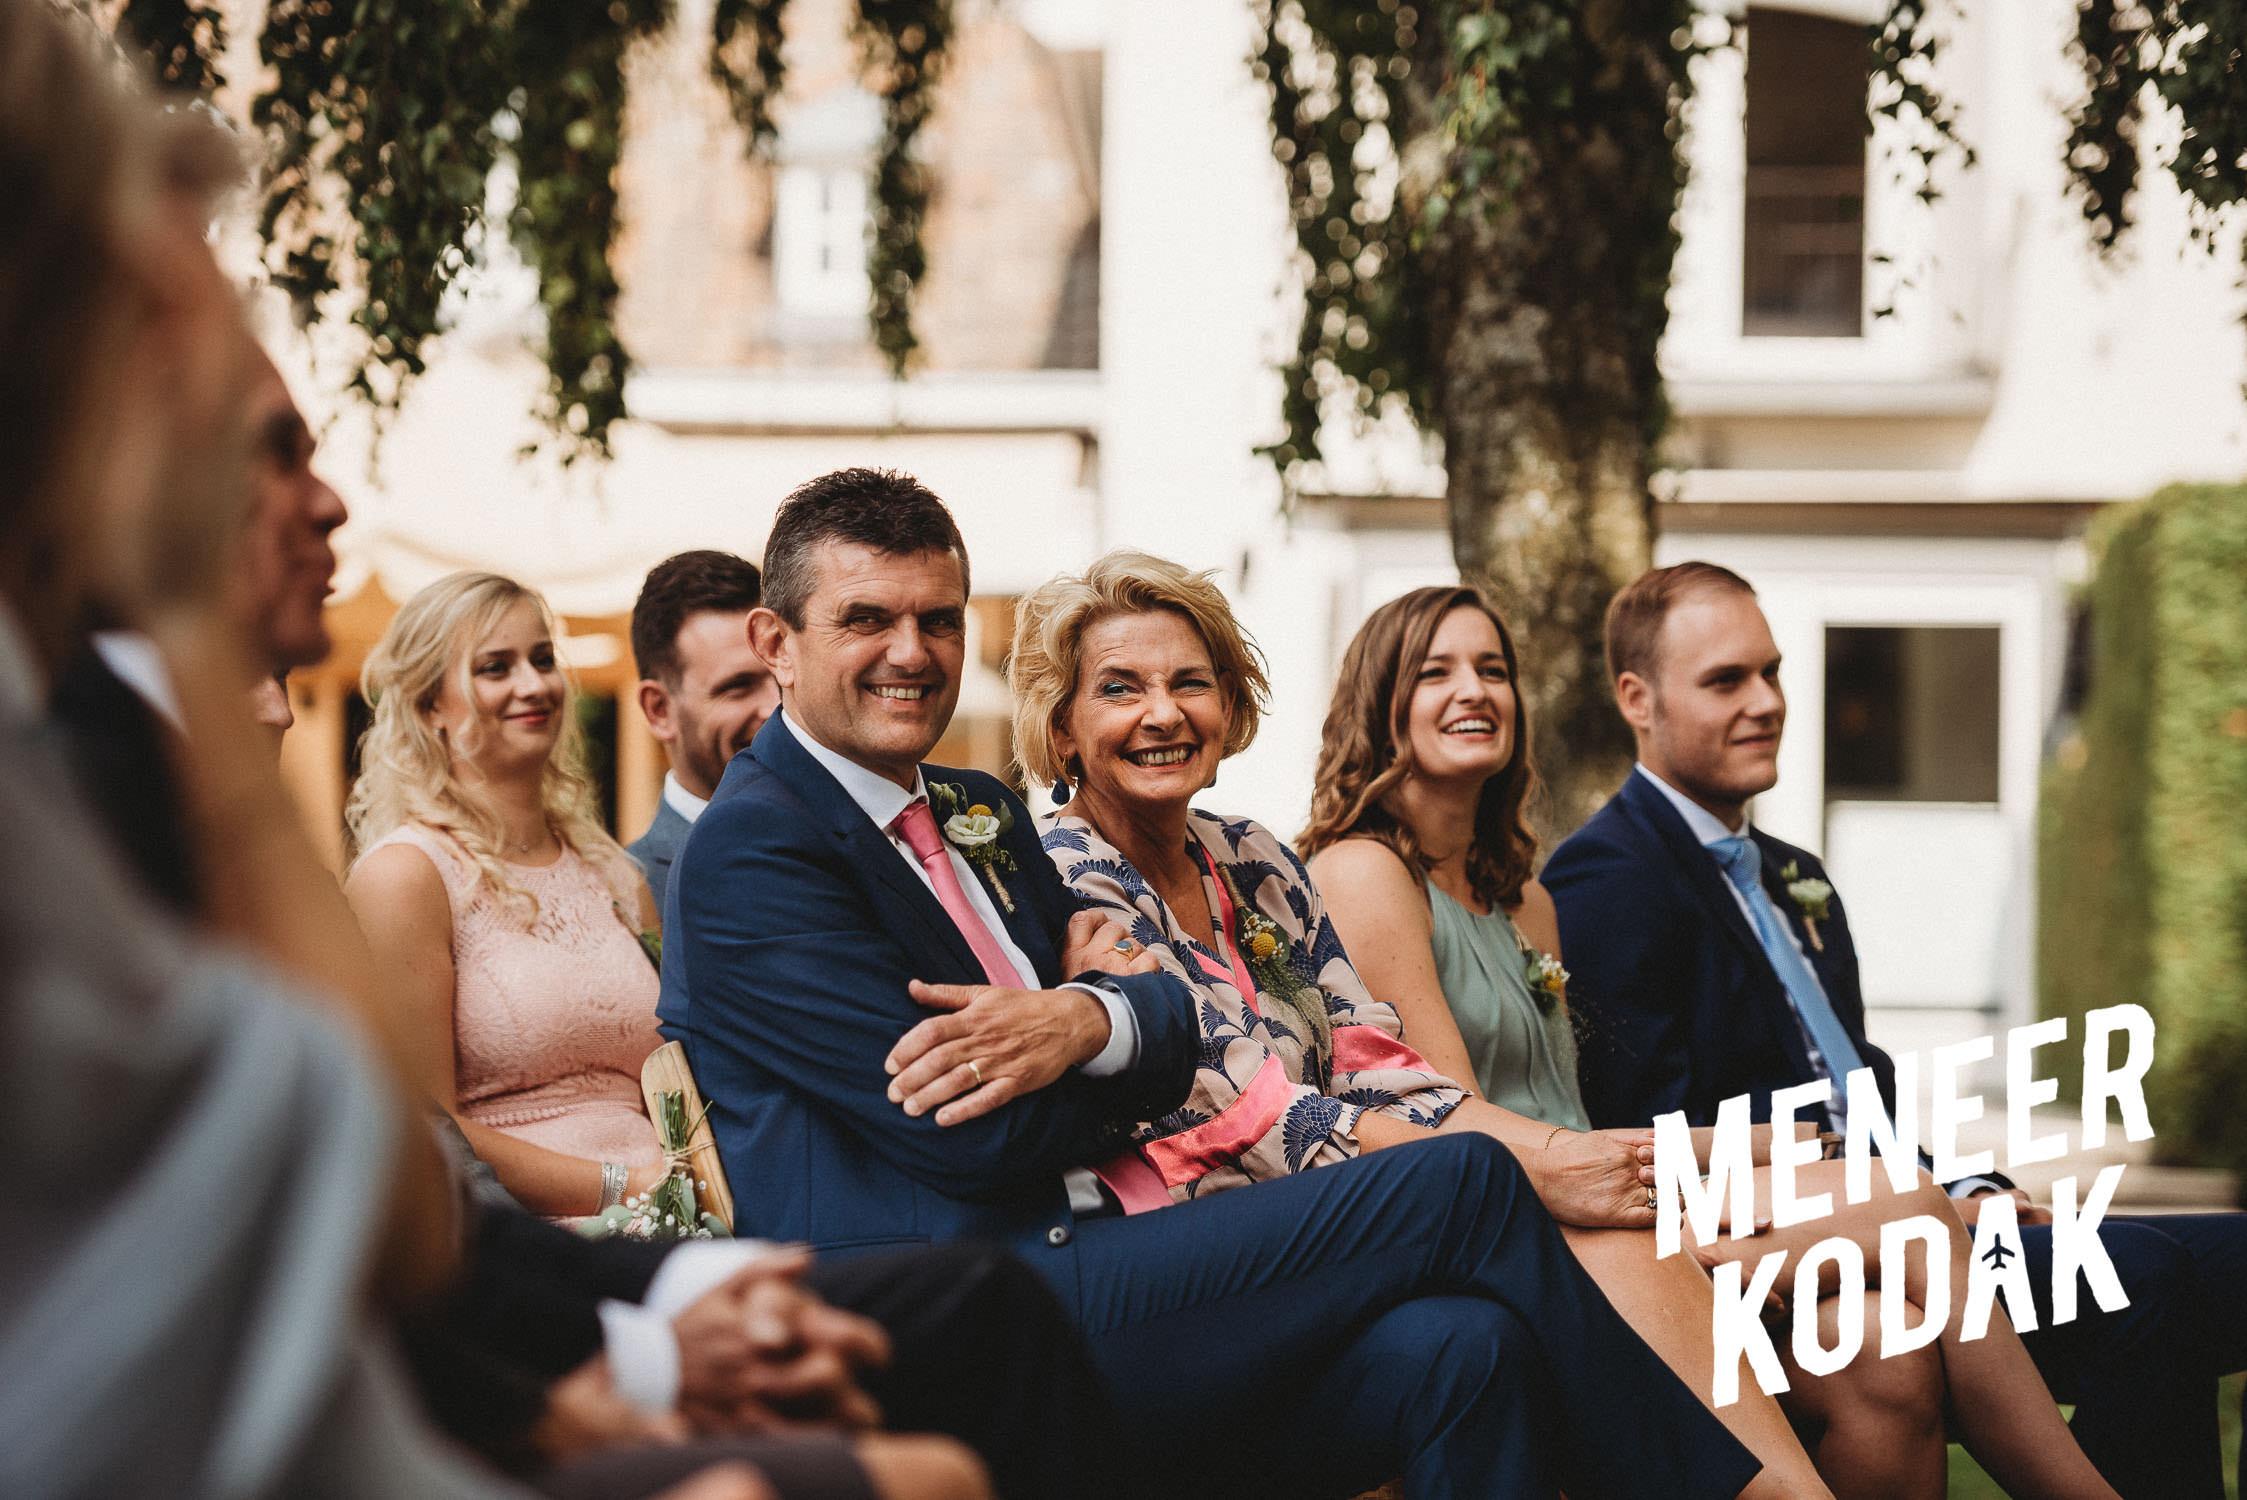 Meneer Kodak - Trouwreportage - Breda - E&M-108.jpg